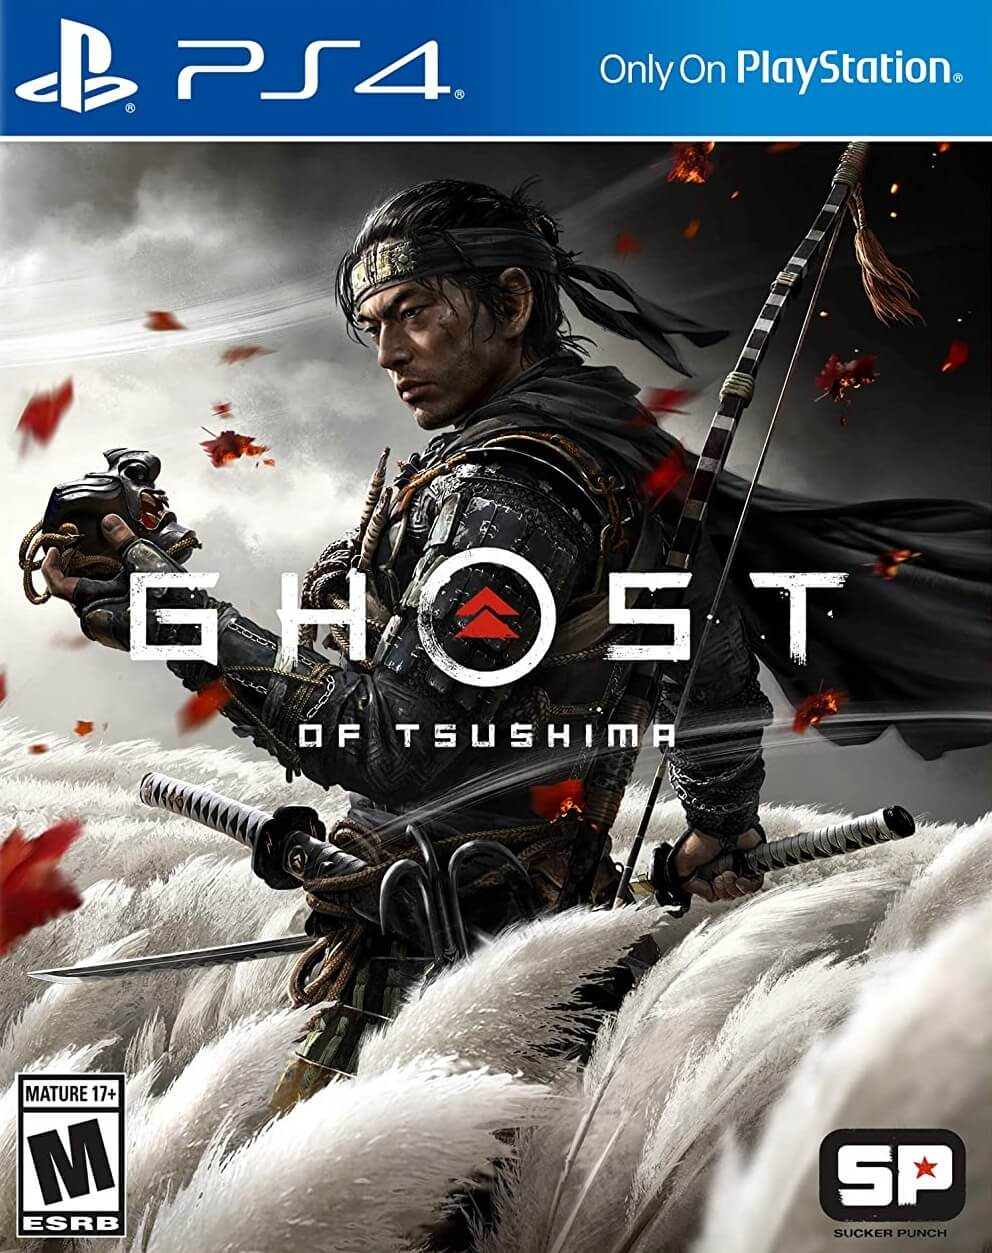 Ghost of Tsushima PS4 boxart